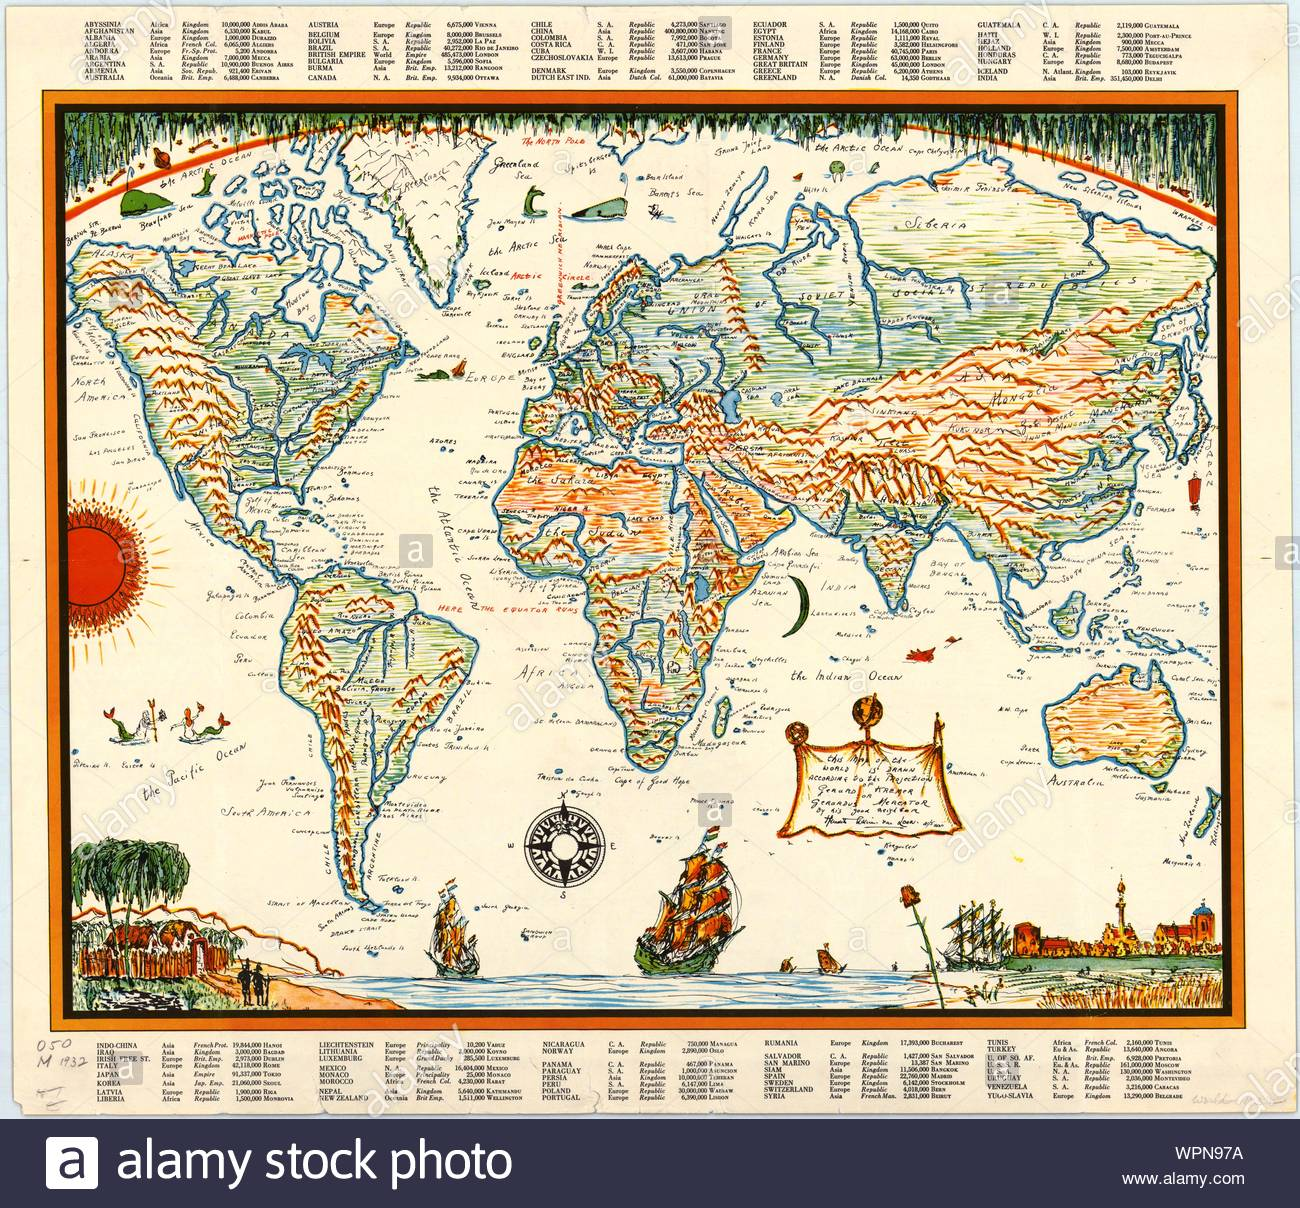 https www alamy com digital old world map printable download vintage world map printable map large world map high resolution world map poster image272146206 html